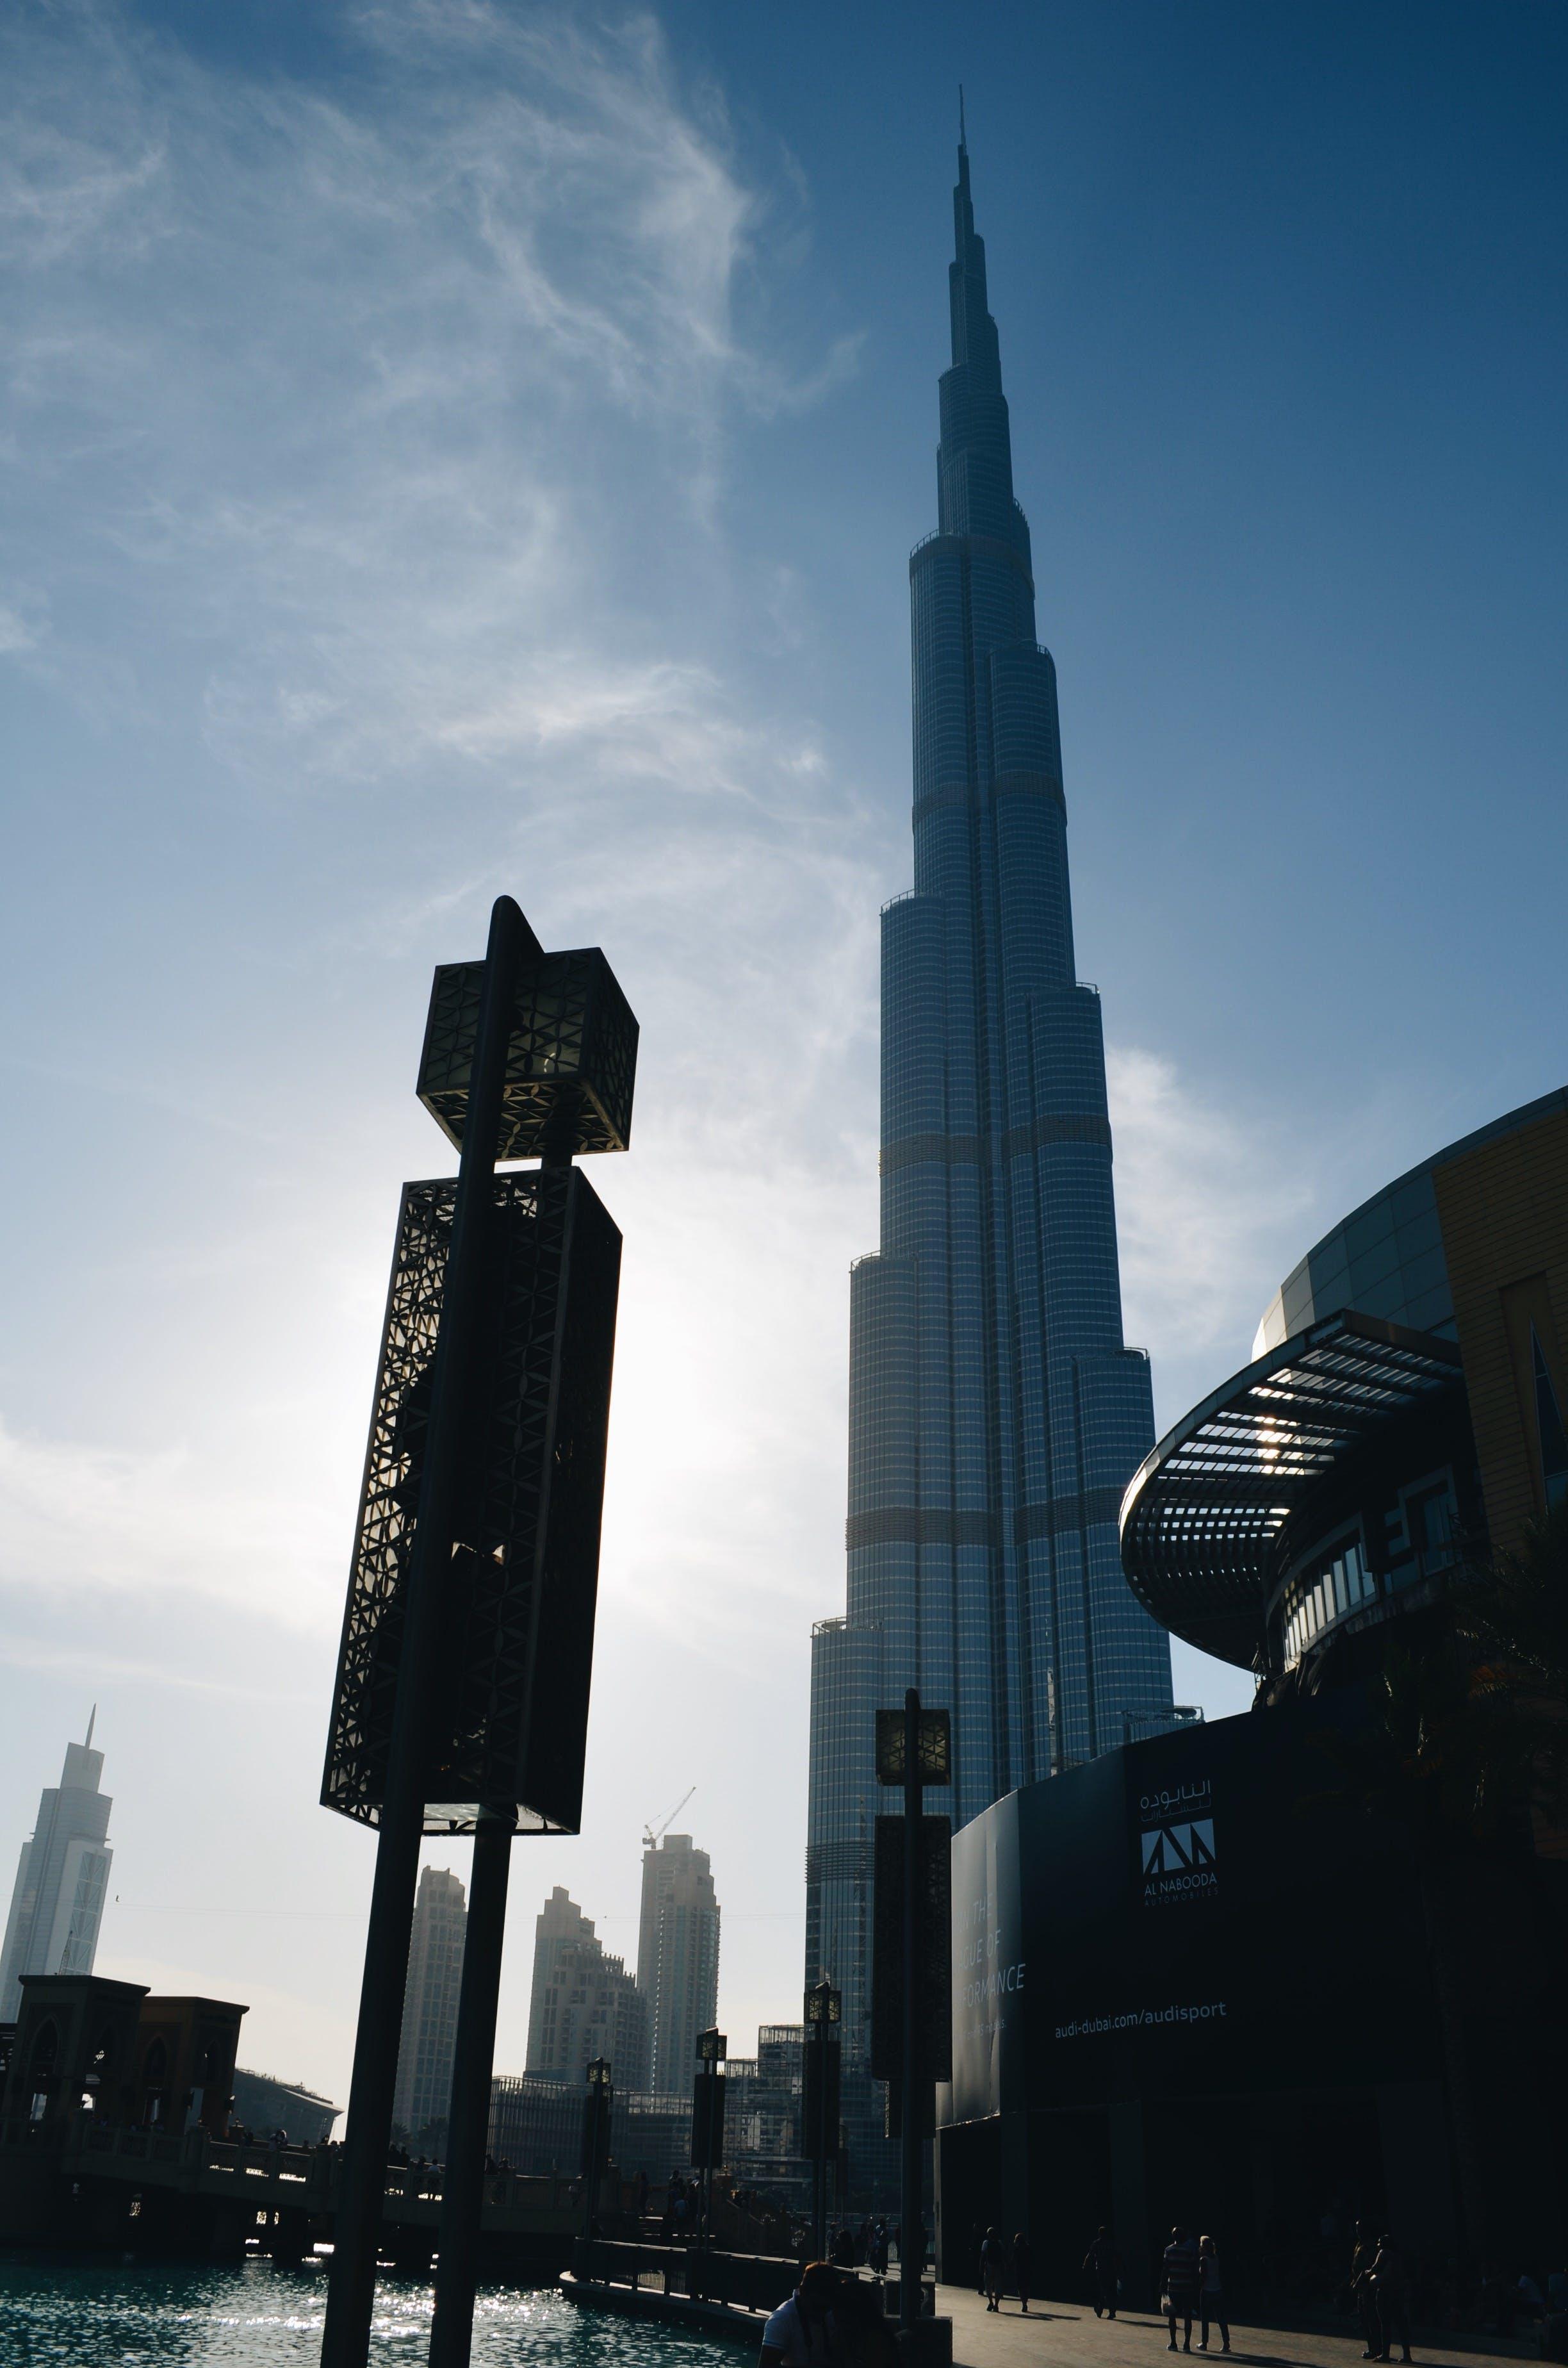 Free stock photo of city, skyscraper, dubai, burj khalifa